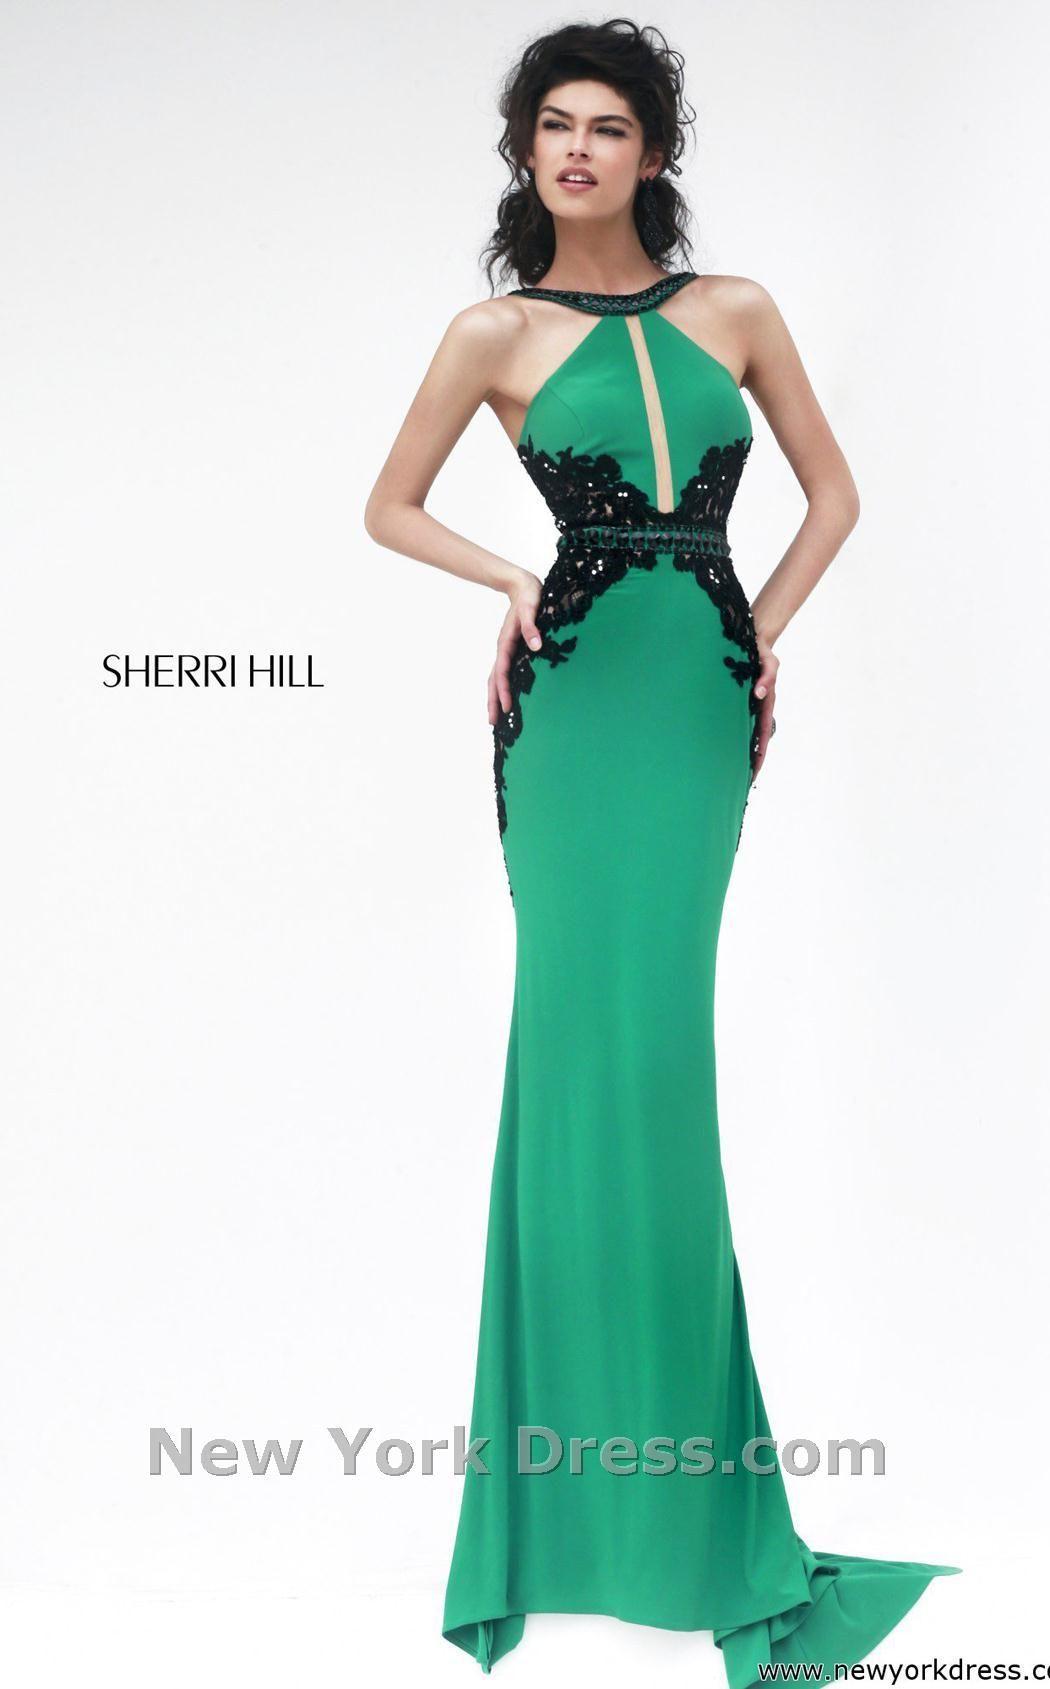 sherri hill thumbnail gowns u holiday dresses